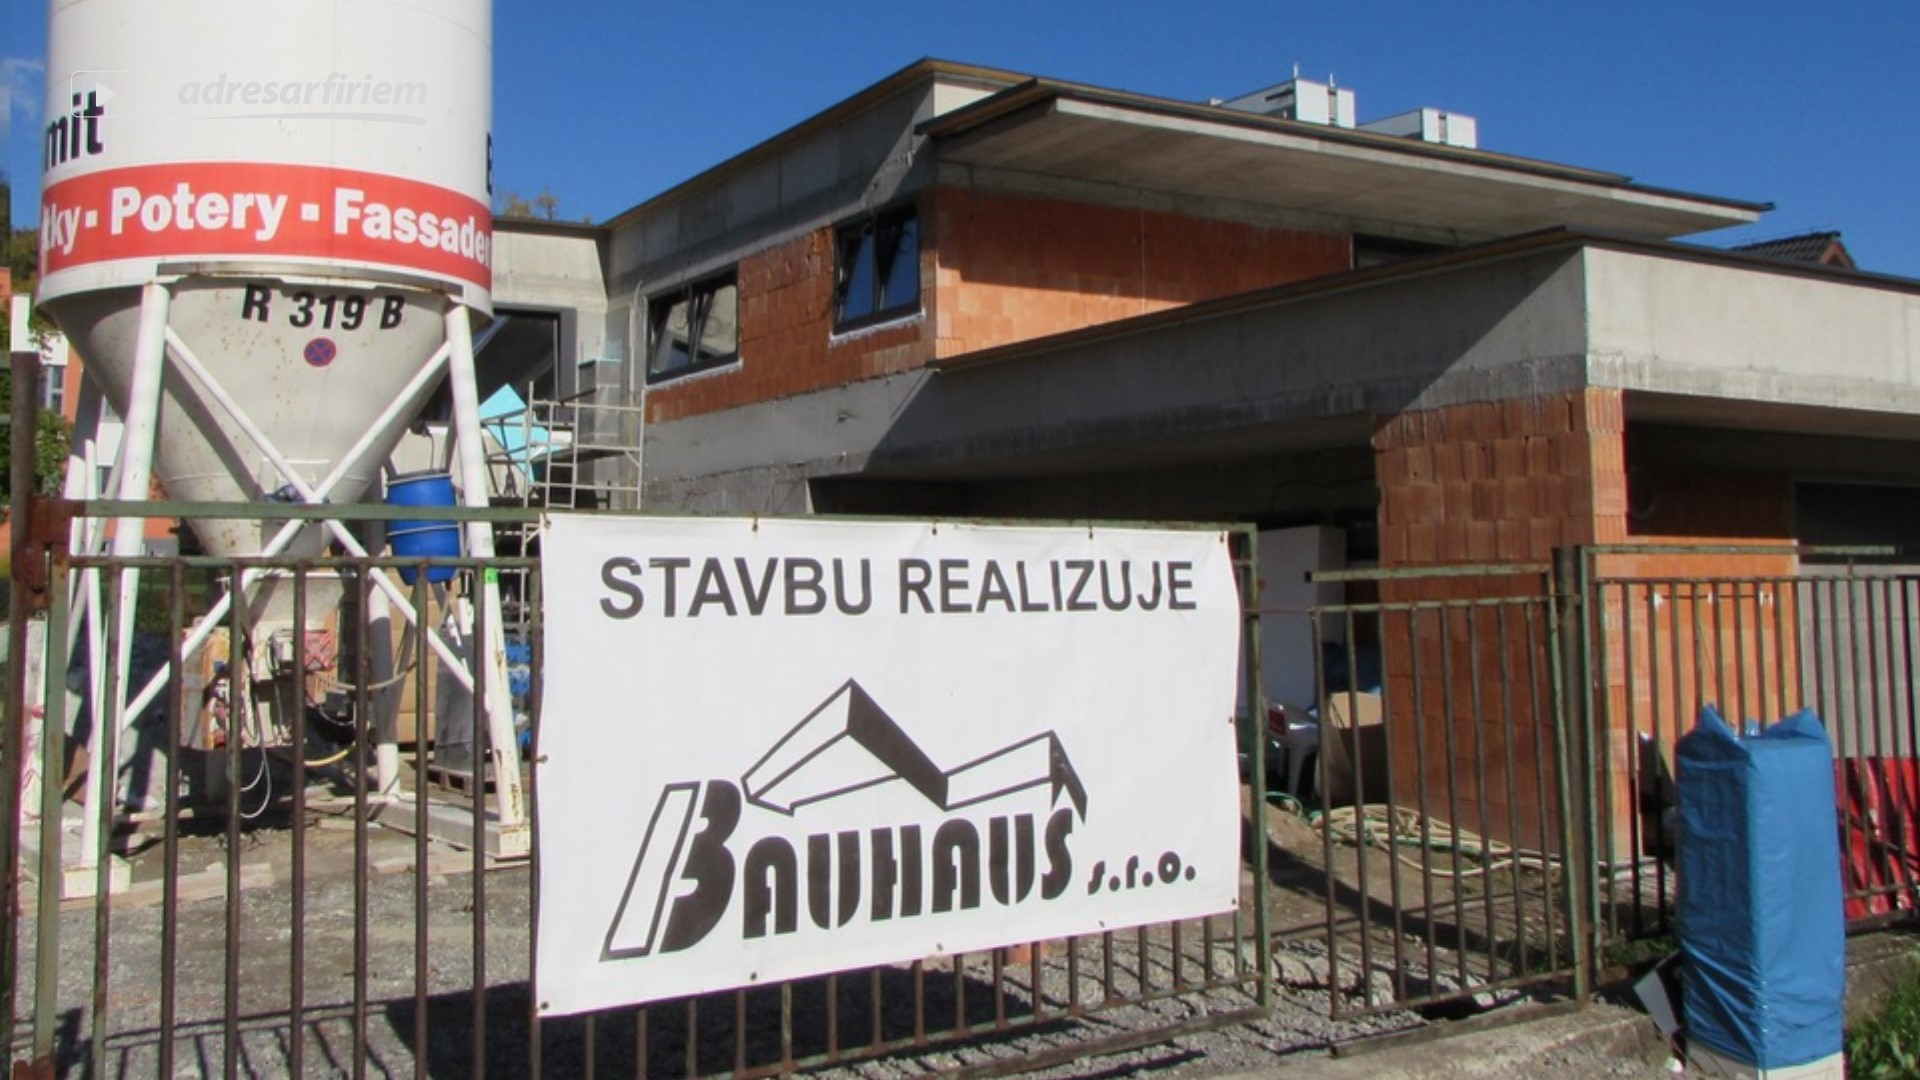 Video BAUHAUS s.r.o. Banská Bystrica